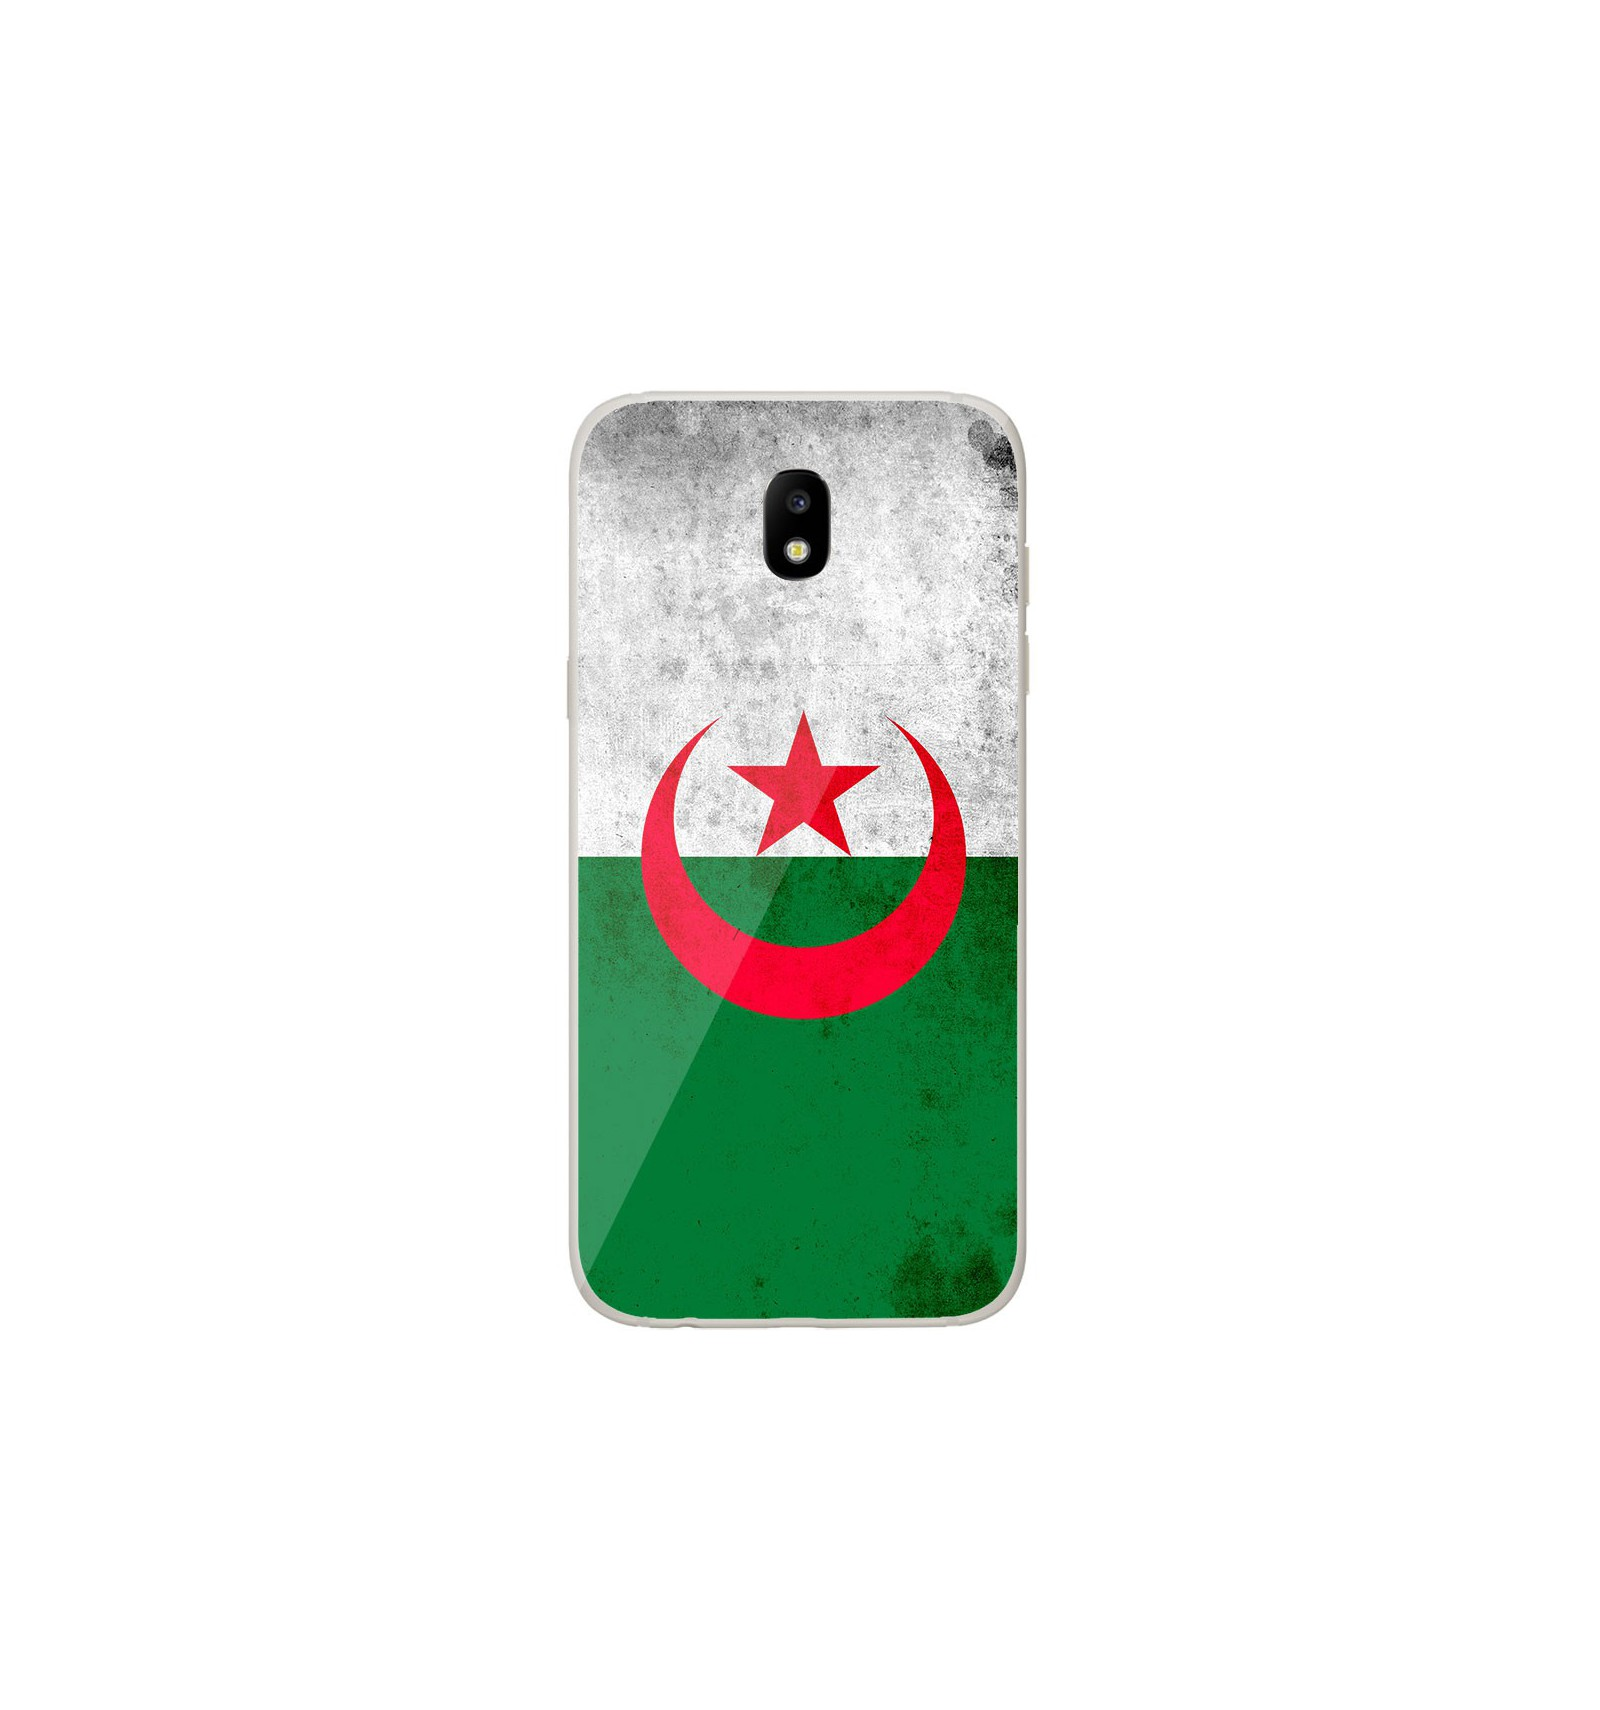 coque samsung j3 algerie